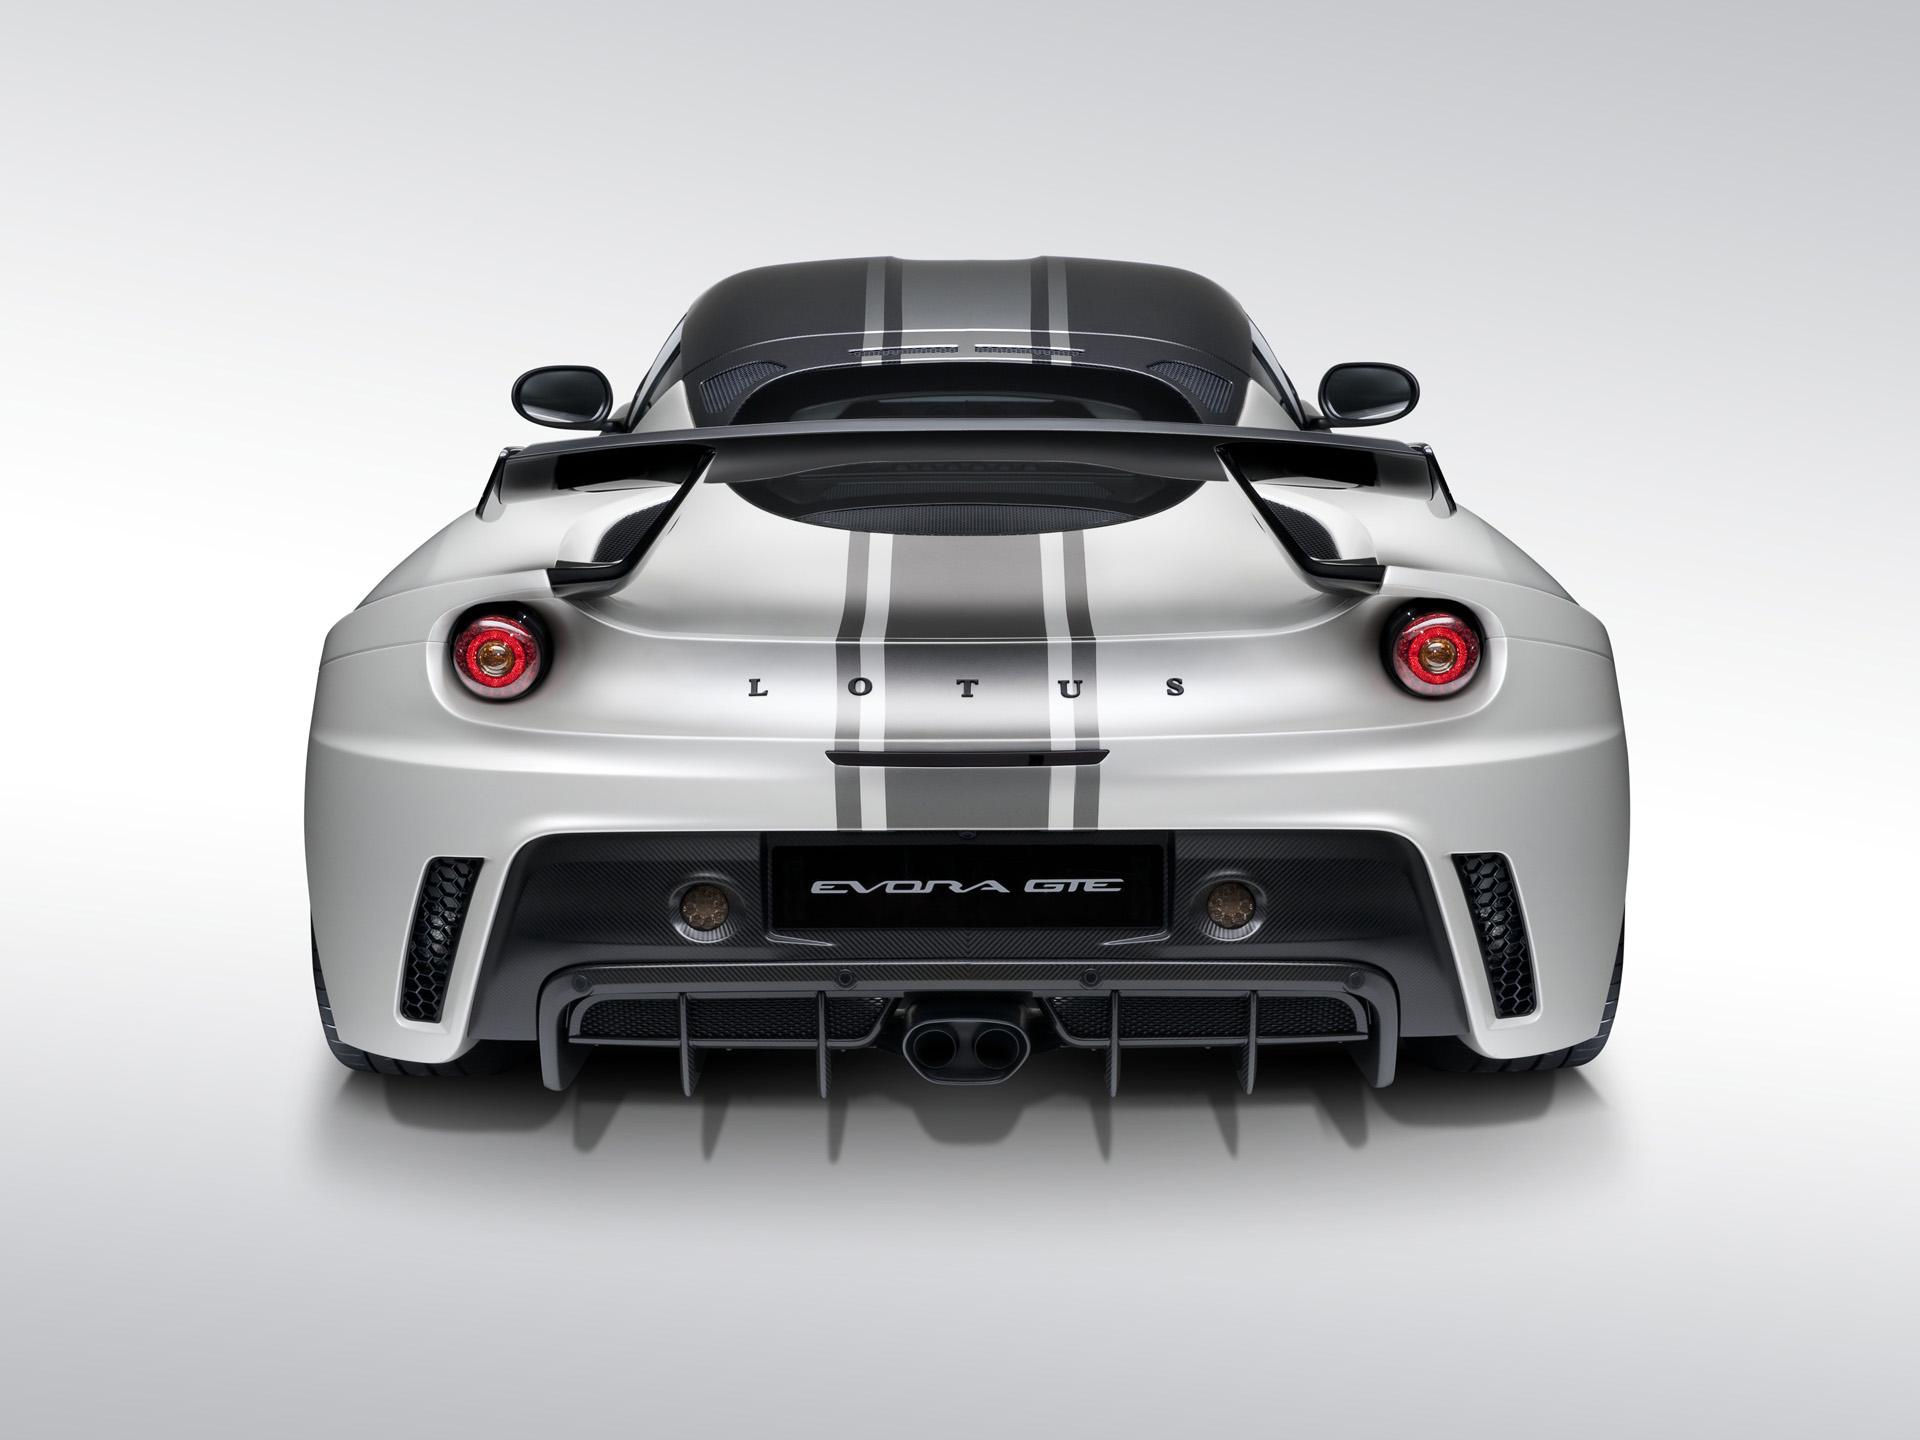 https://www.automobilesreview.com/img/2012-lotus-evora-gte/2012-lotus-evora-gte-05.jpg